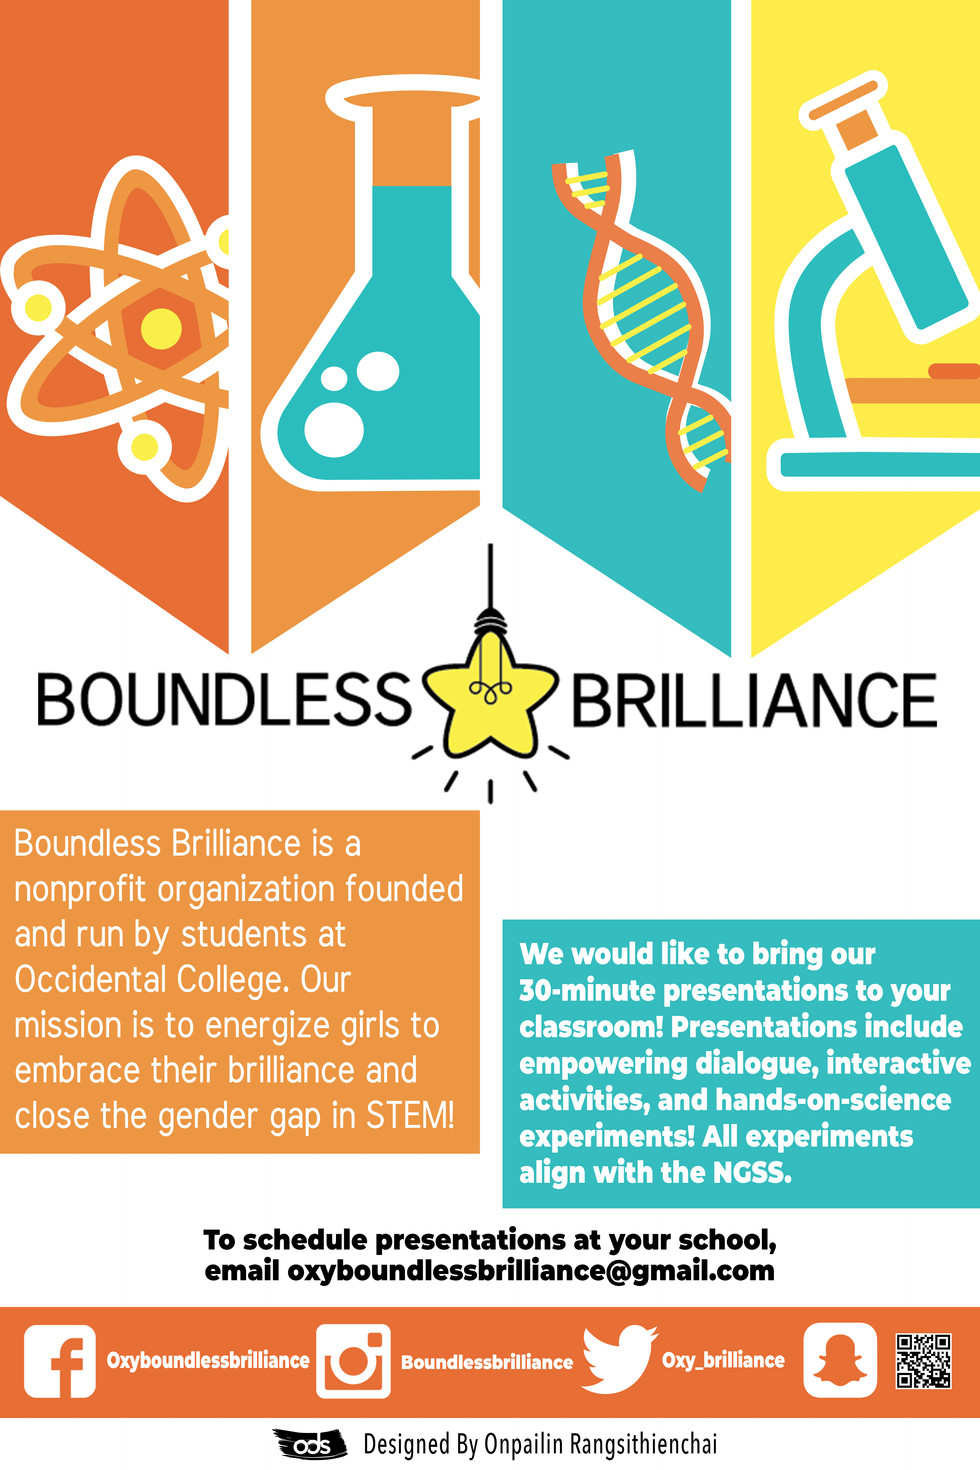 Boundless Brilliance promotion